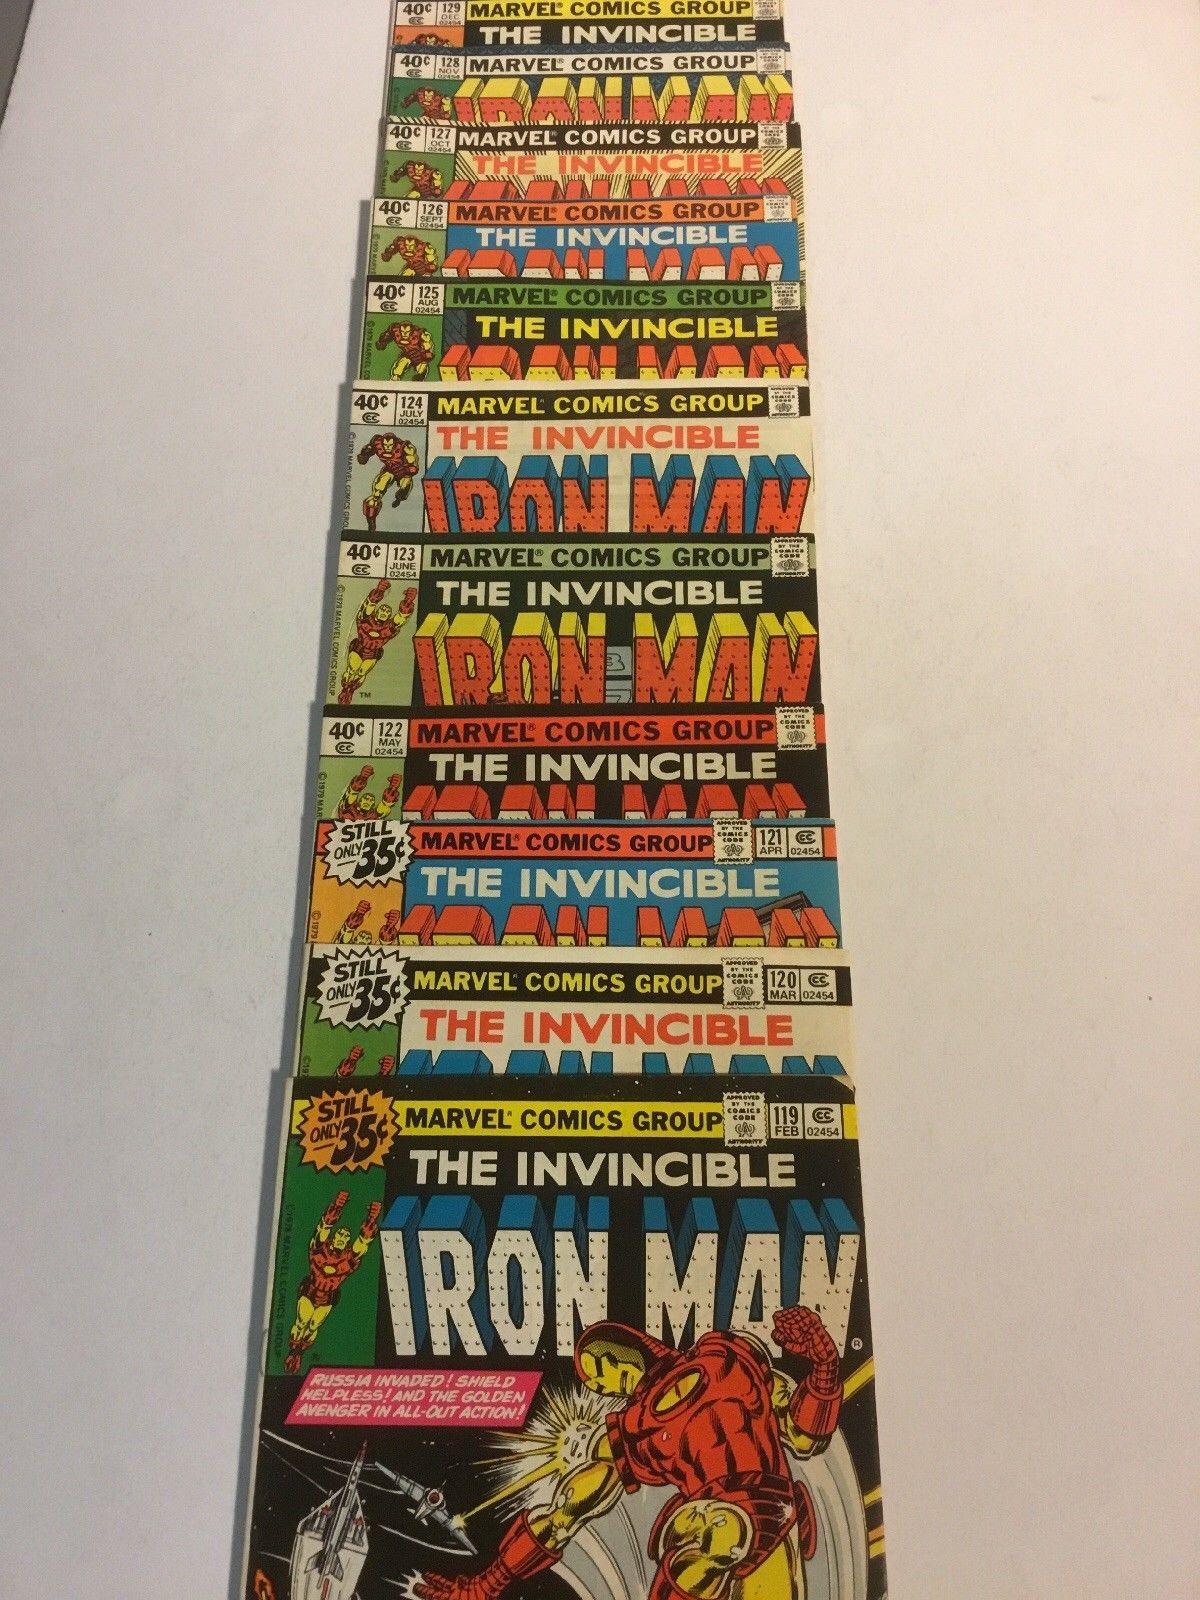 Invincible Iron Man lot 119 120 121 122 123 124 125 126 127 128 129 marvel